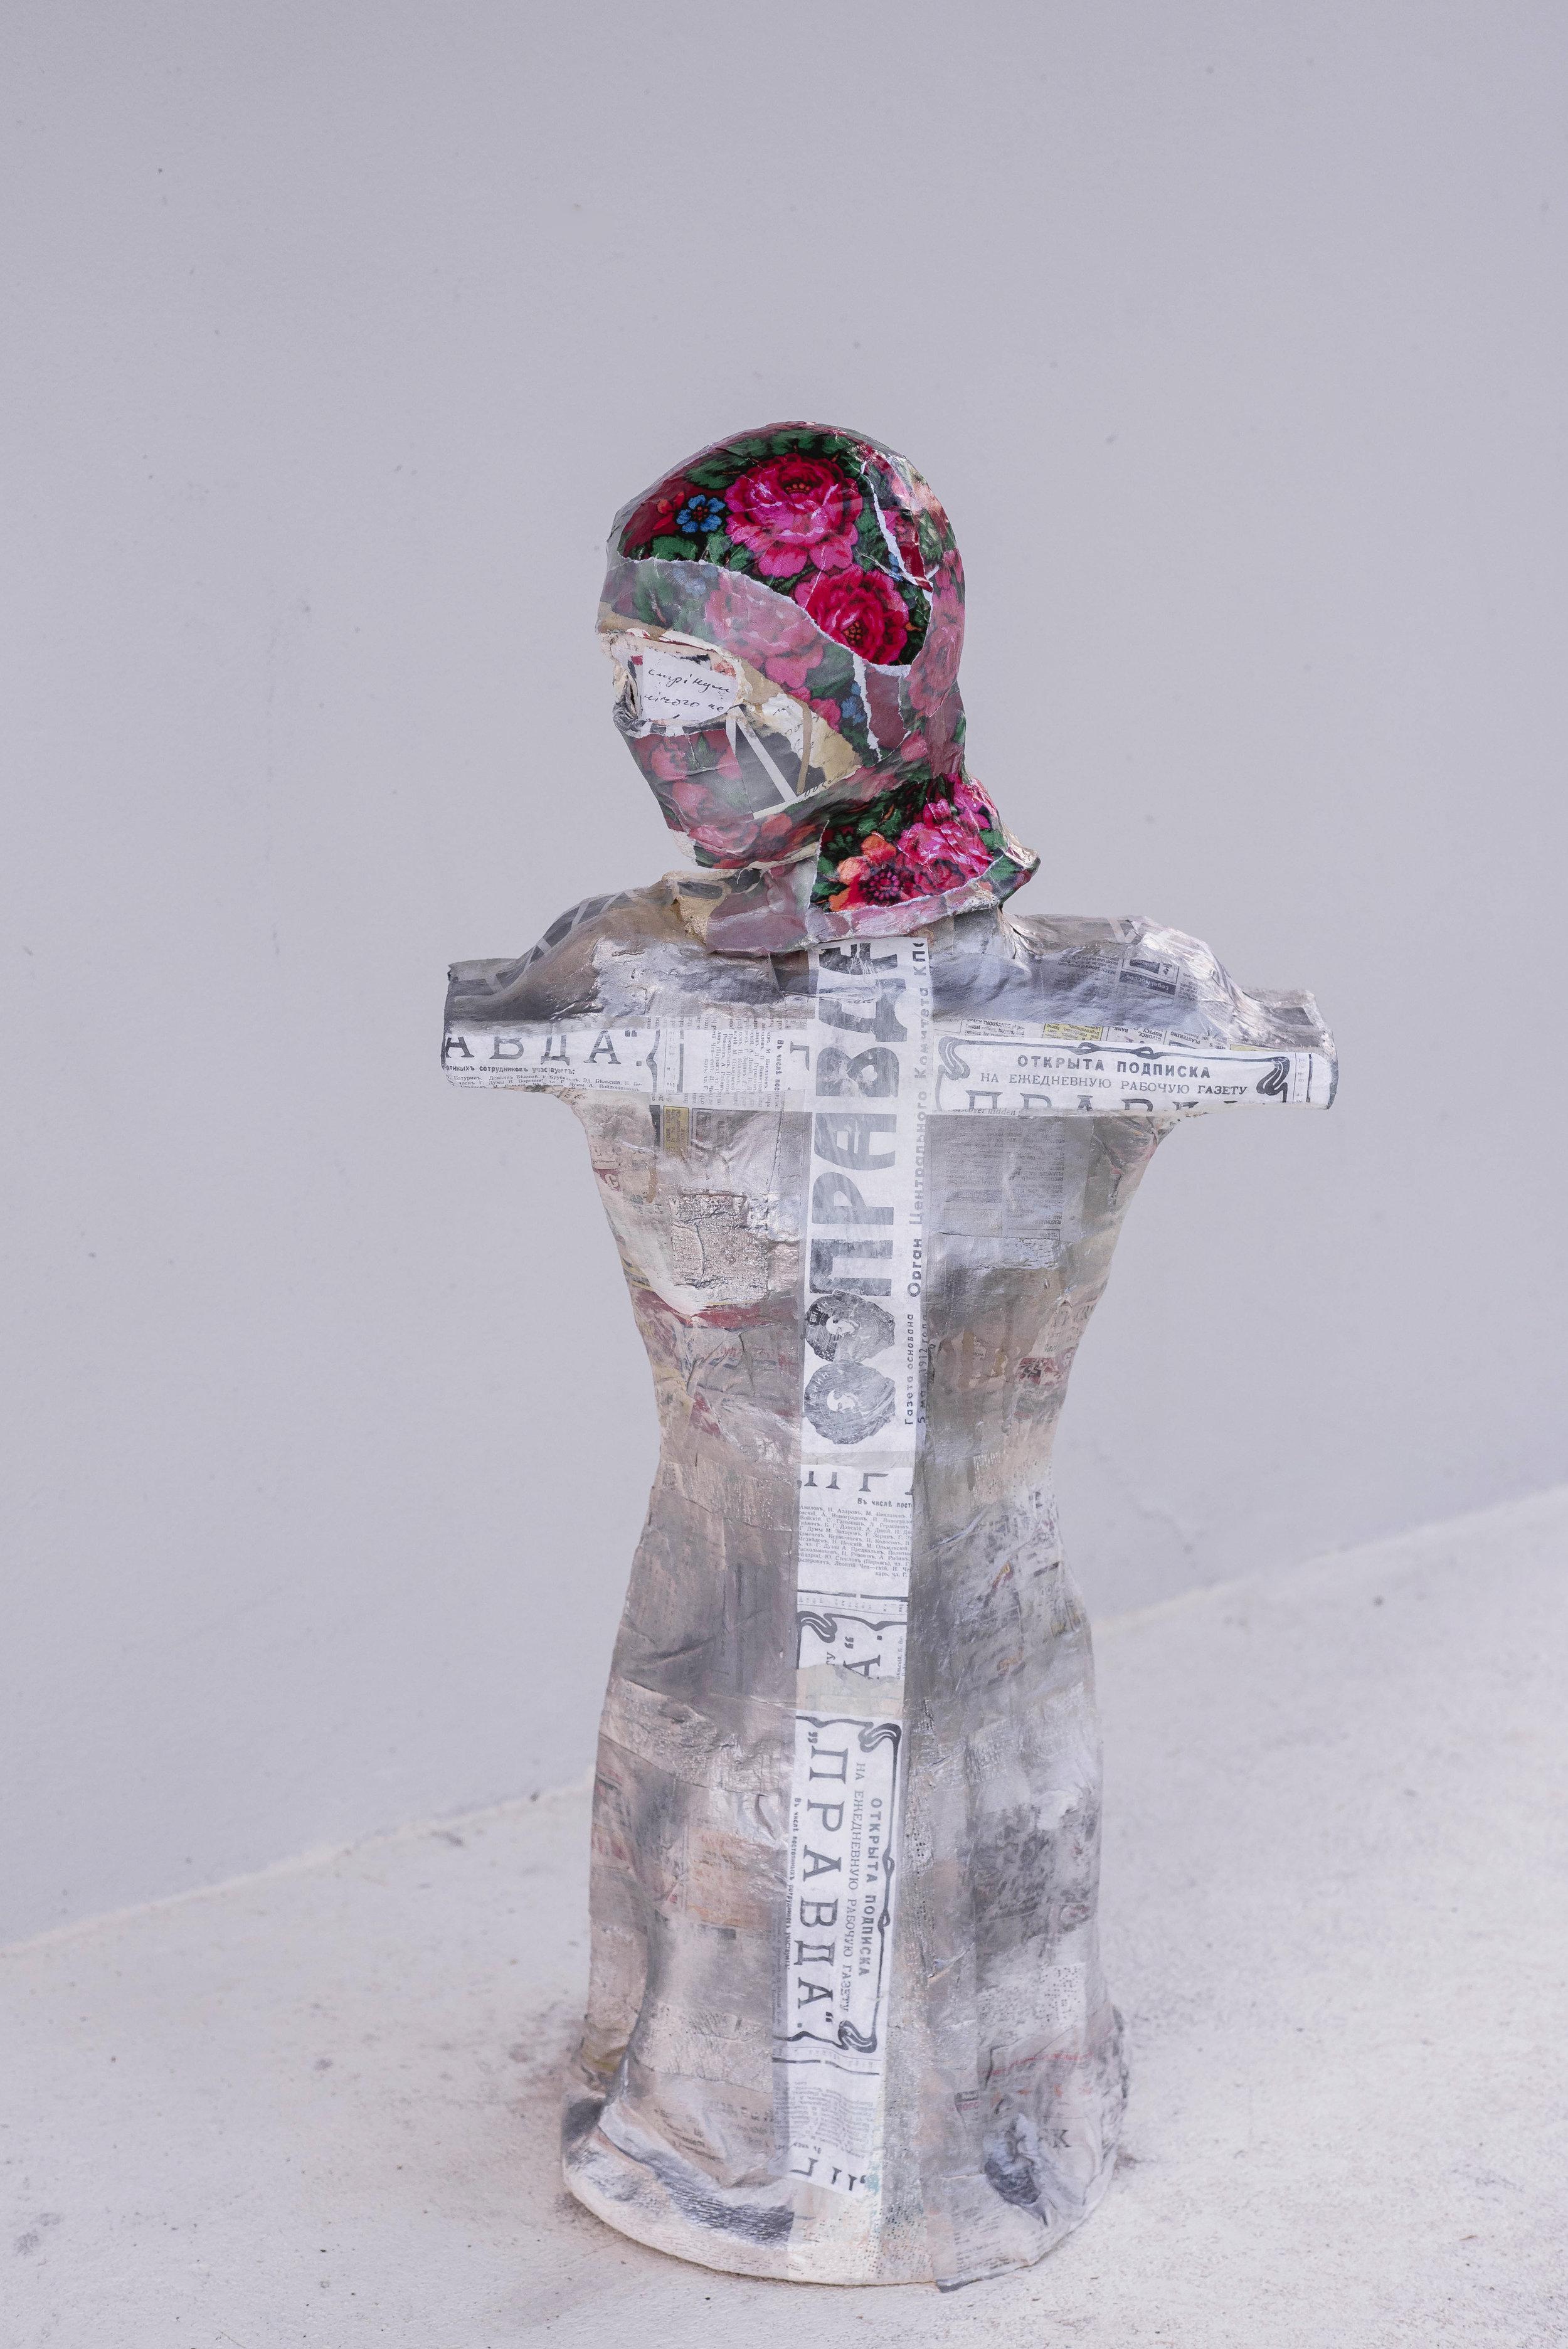 Rebel  1.0 x 0.5 meters, 2018 Paper mache, plaster of paris, styrofoam, cardboard, acrylic paint, paper, duct tape, wires, fabric, spray paint